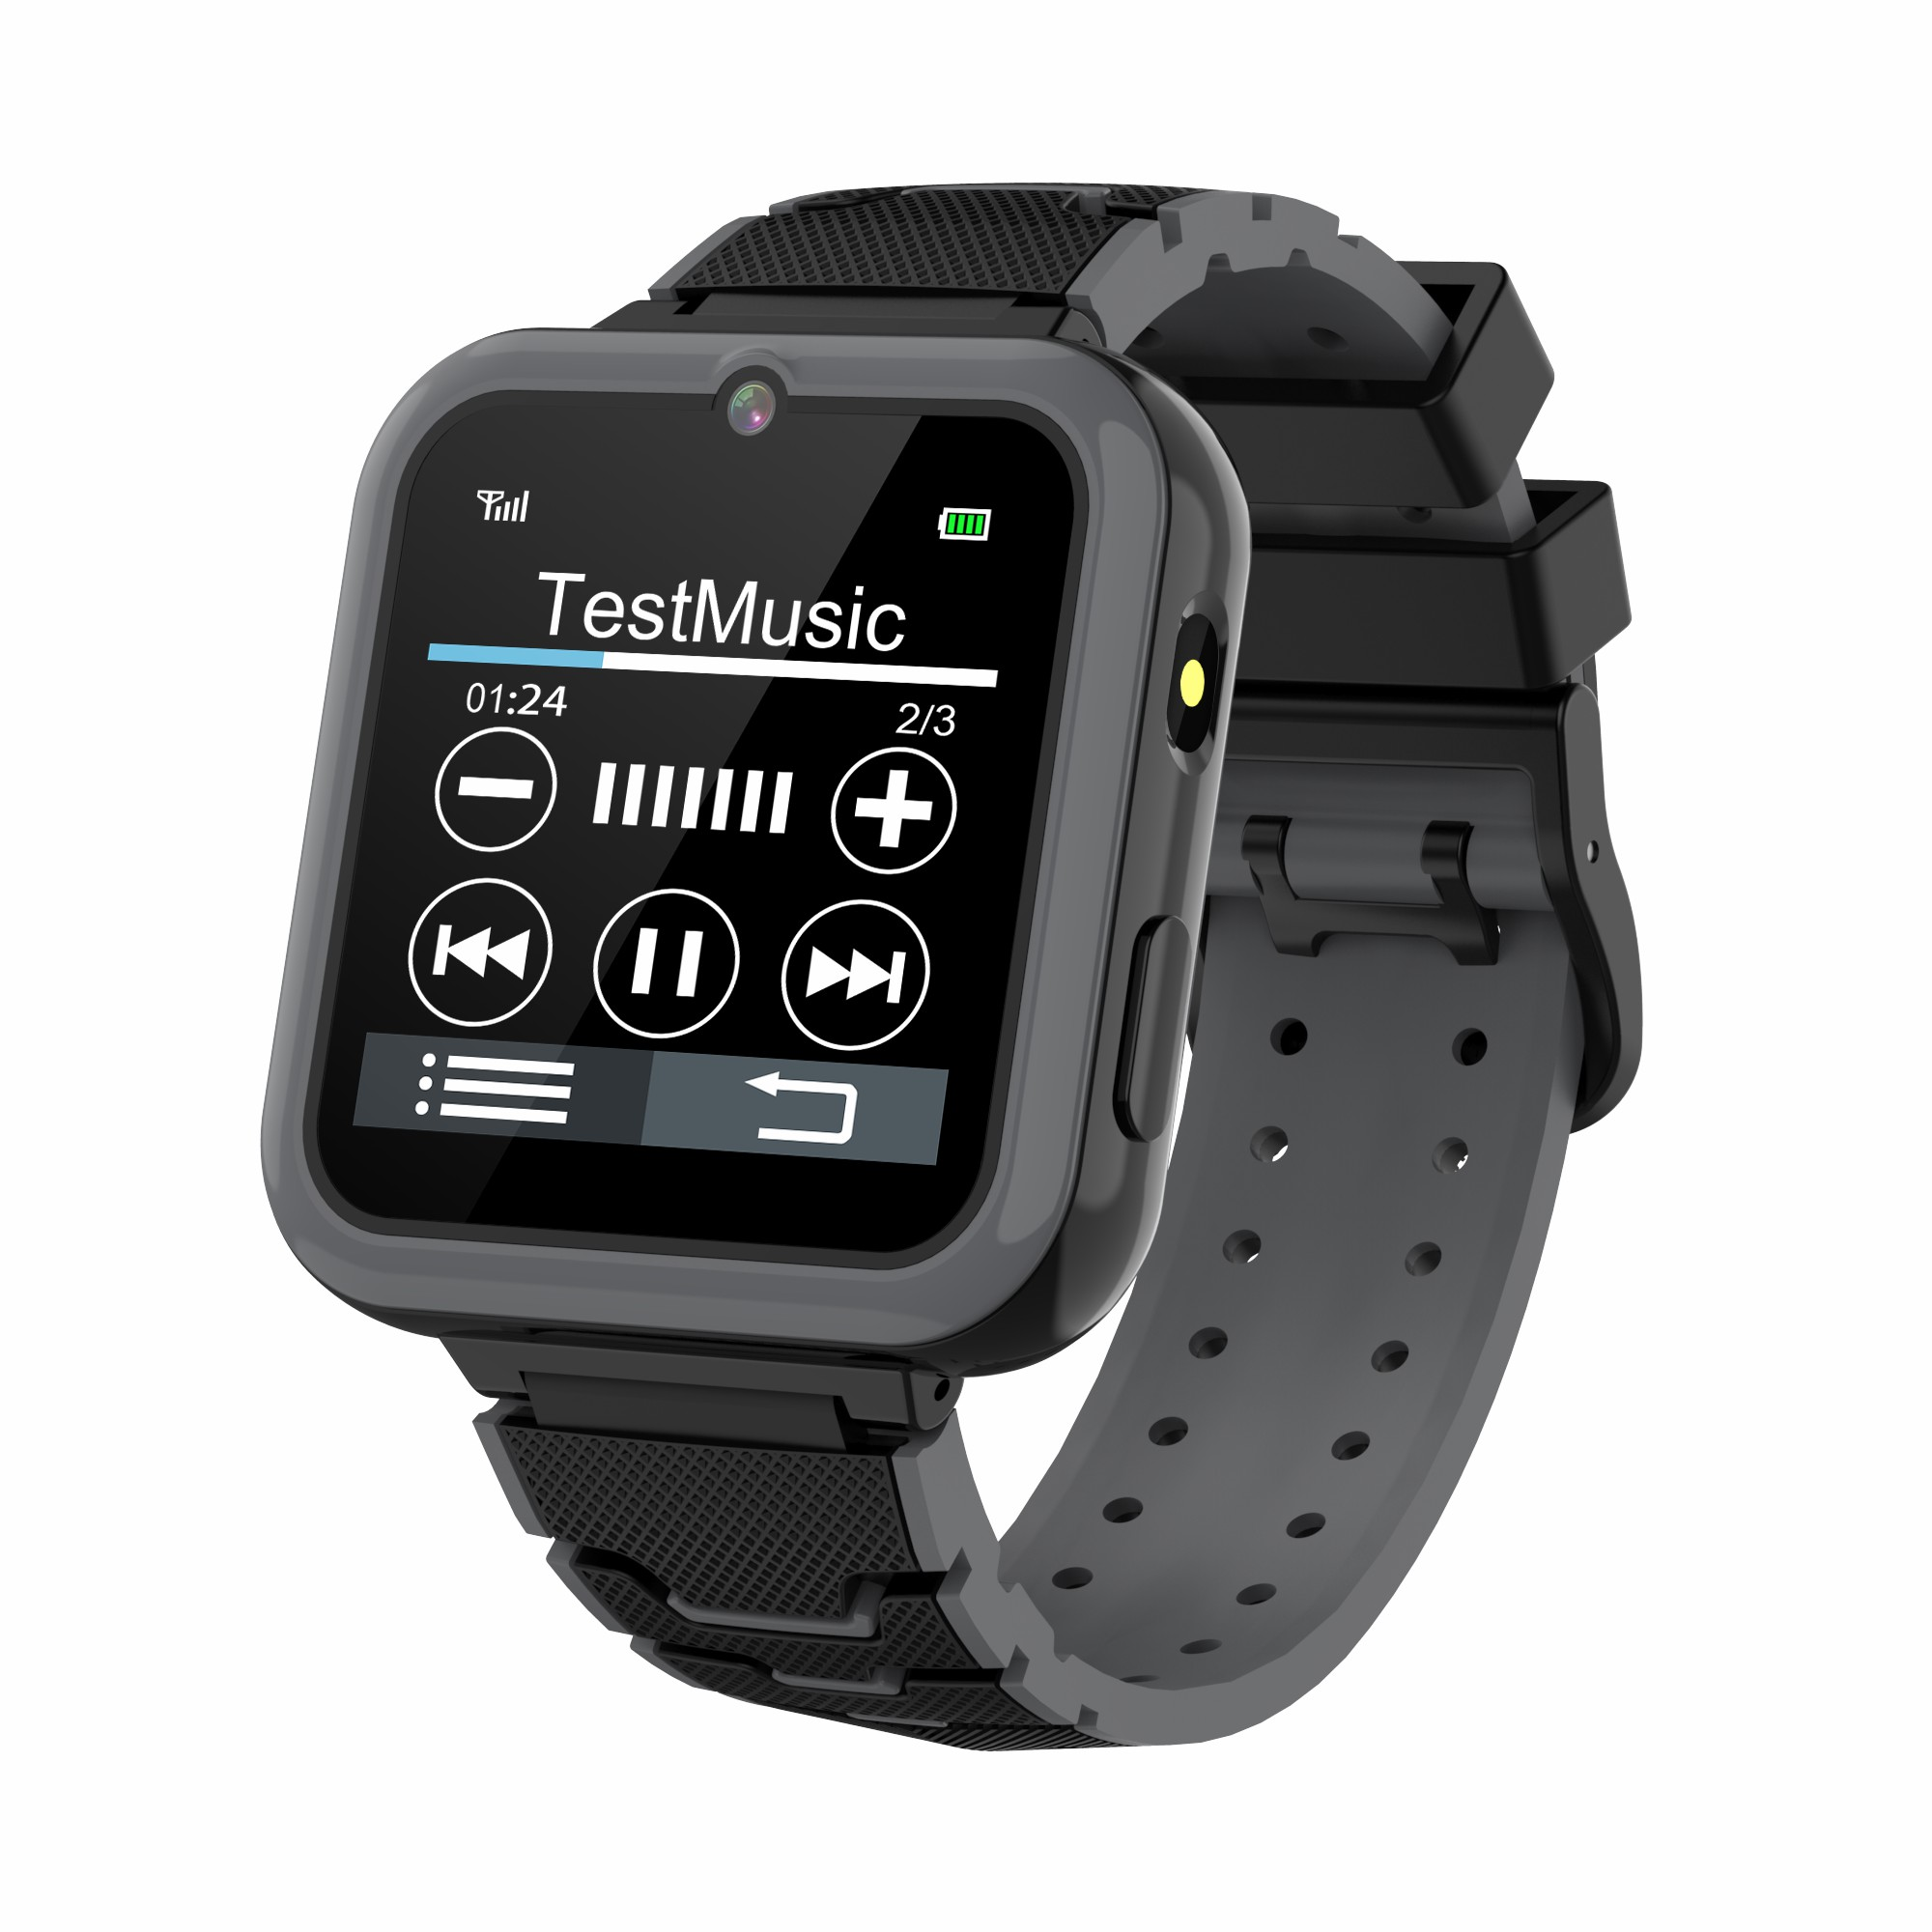 Y16 Kids Smart Watch Multi-language Ips Screen Game Camera Video Phone Smartwatch black